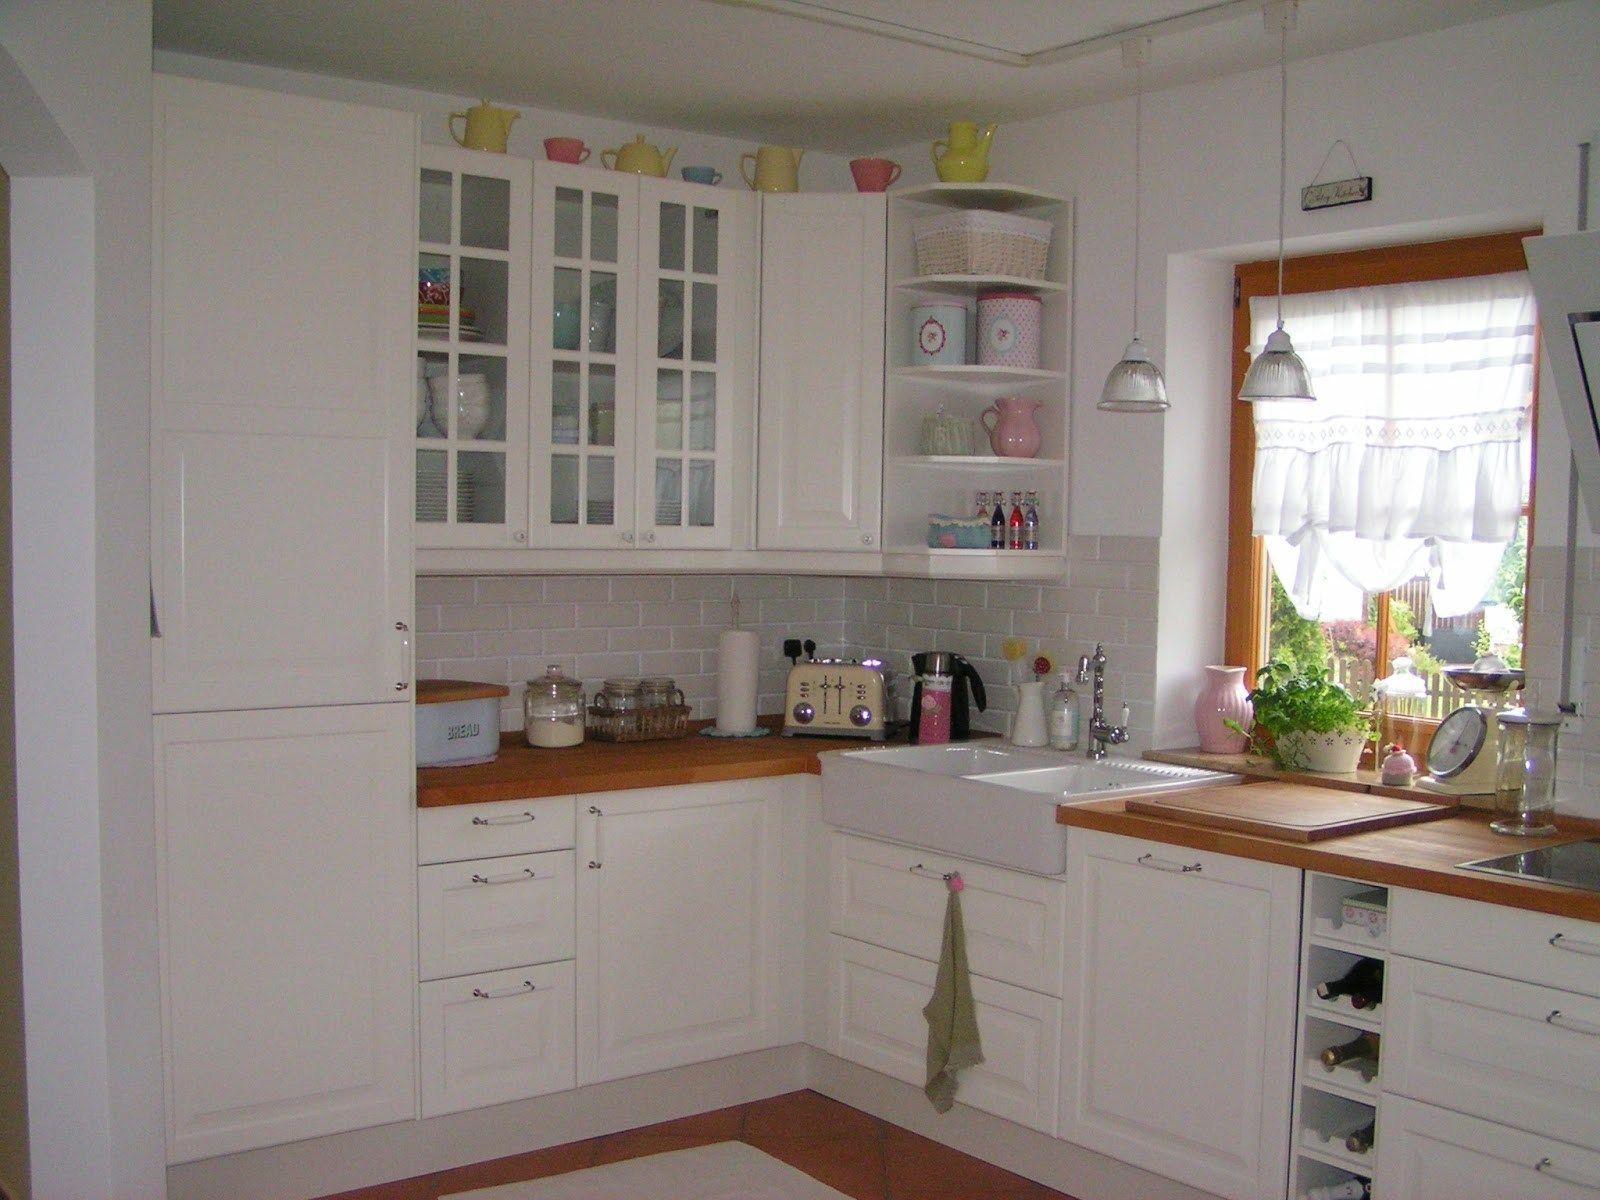 Bodbyn Wei Ikea Kitchens Pinterest Upper Kitchen Cabinets Small Kitchen Remodel Cost Ikea Kitchen